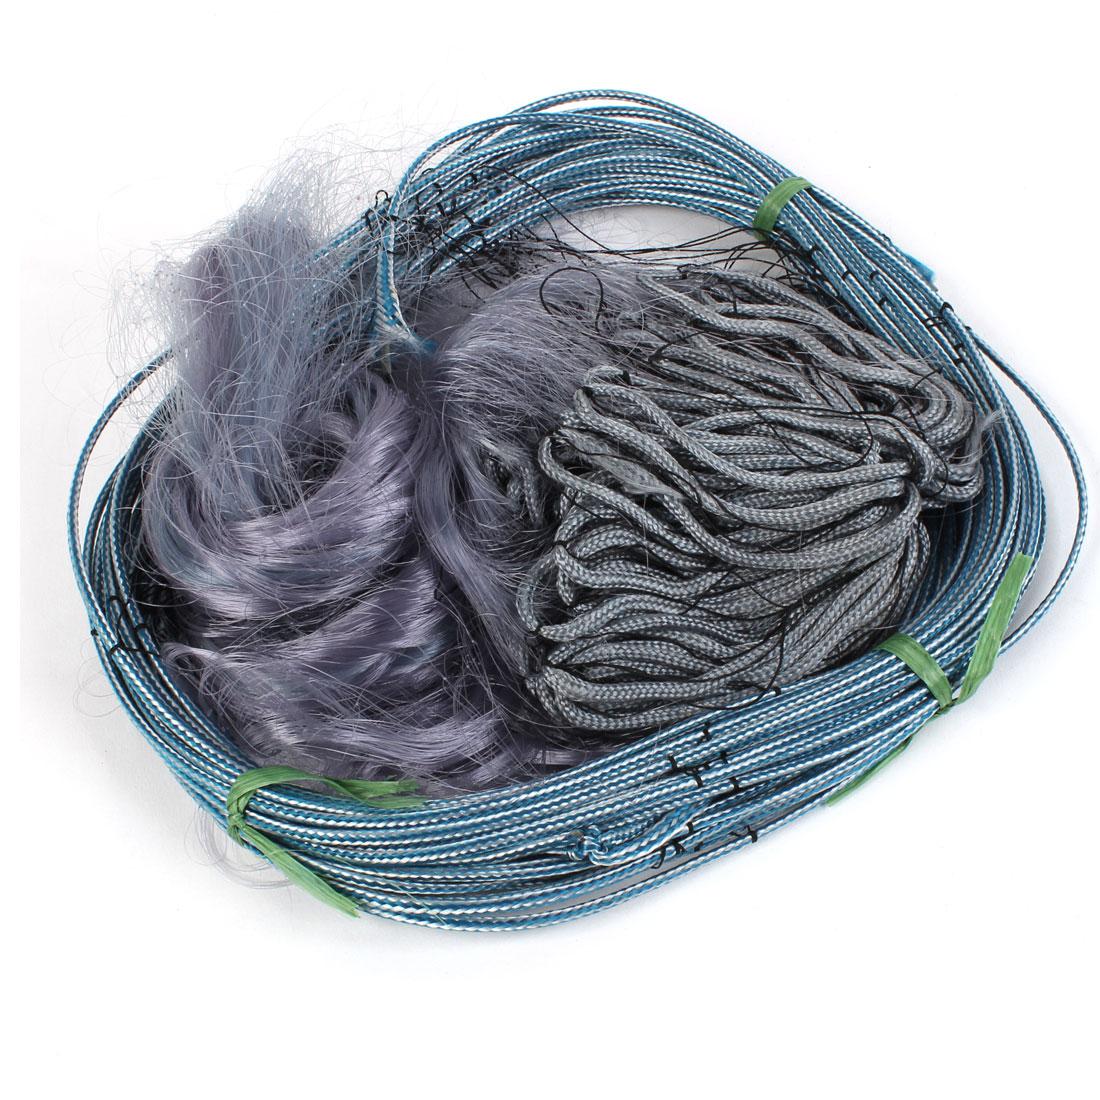 30M Length 1.5M Depth 5cm x 5cm Mesh Hole Fishing Tool Fish Gill Landing Net